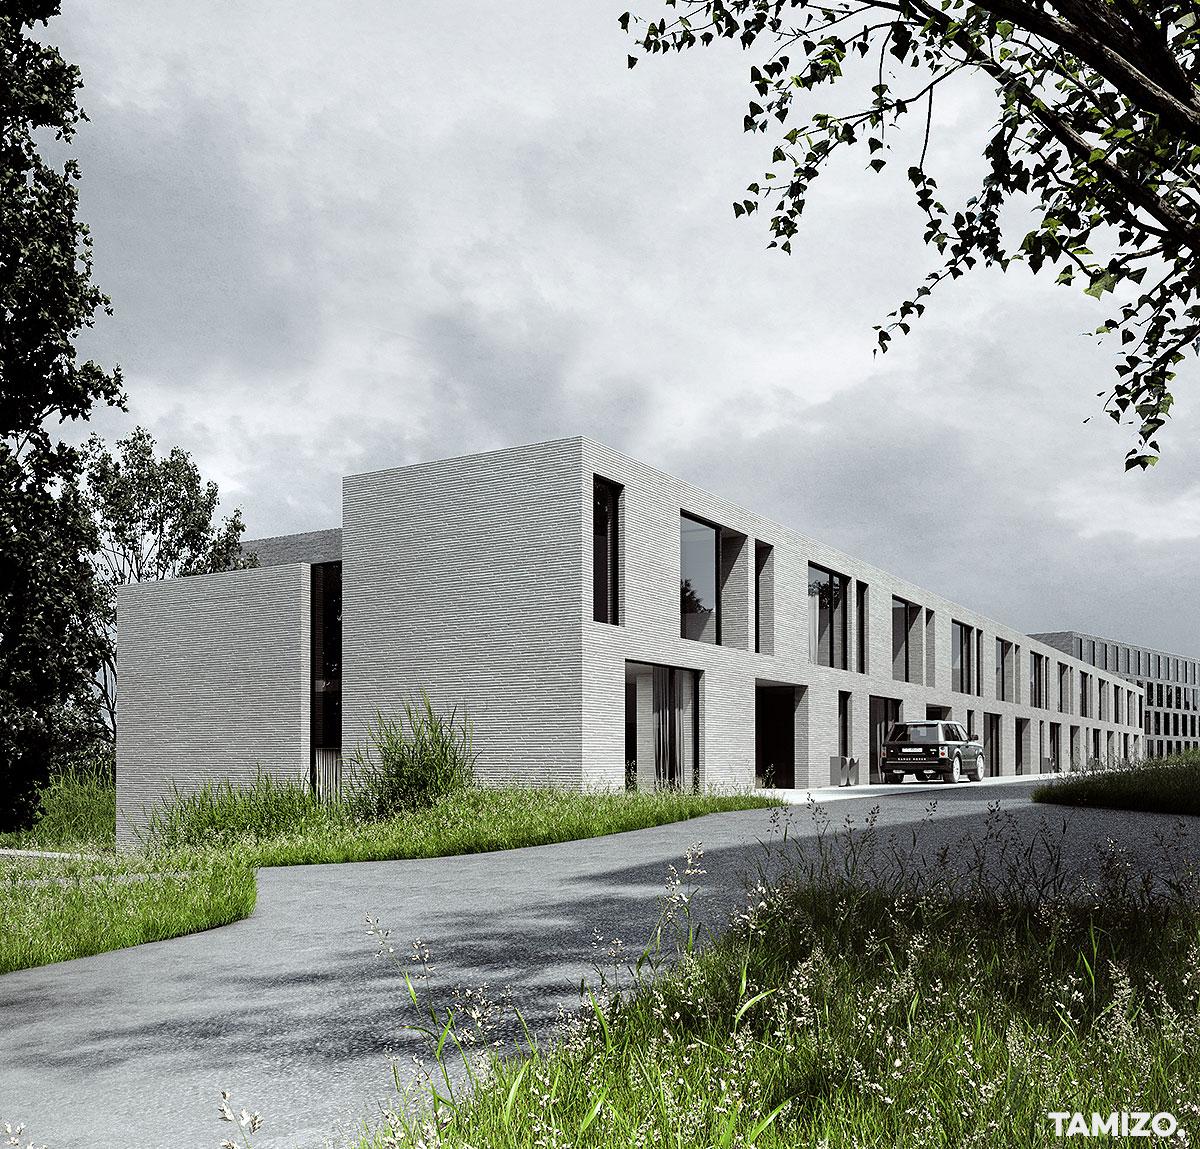 A061_tamizo_architects_competition_tbilisi_georgia_multifamily_houseing_realestate_16